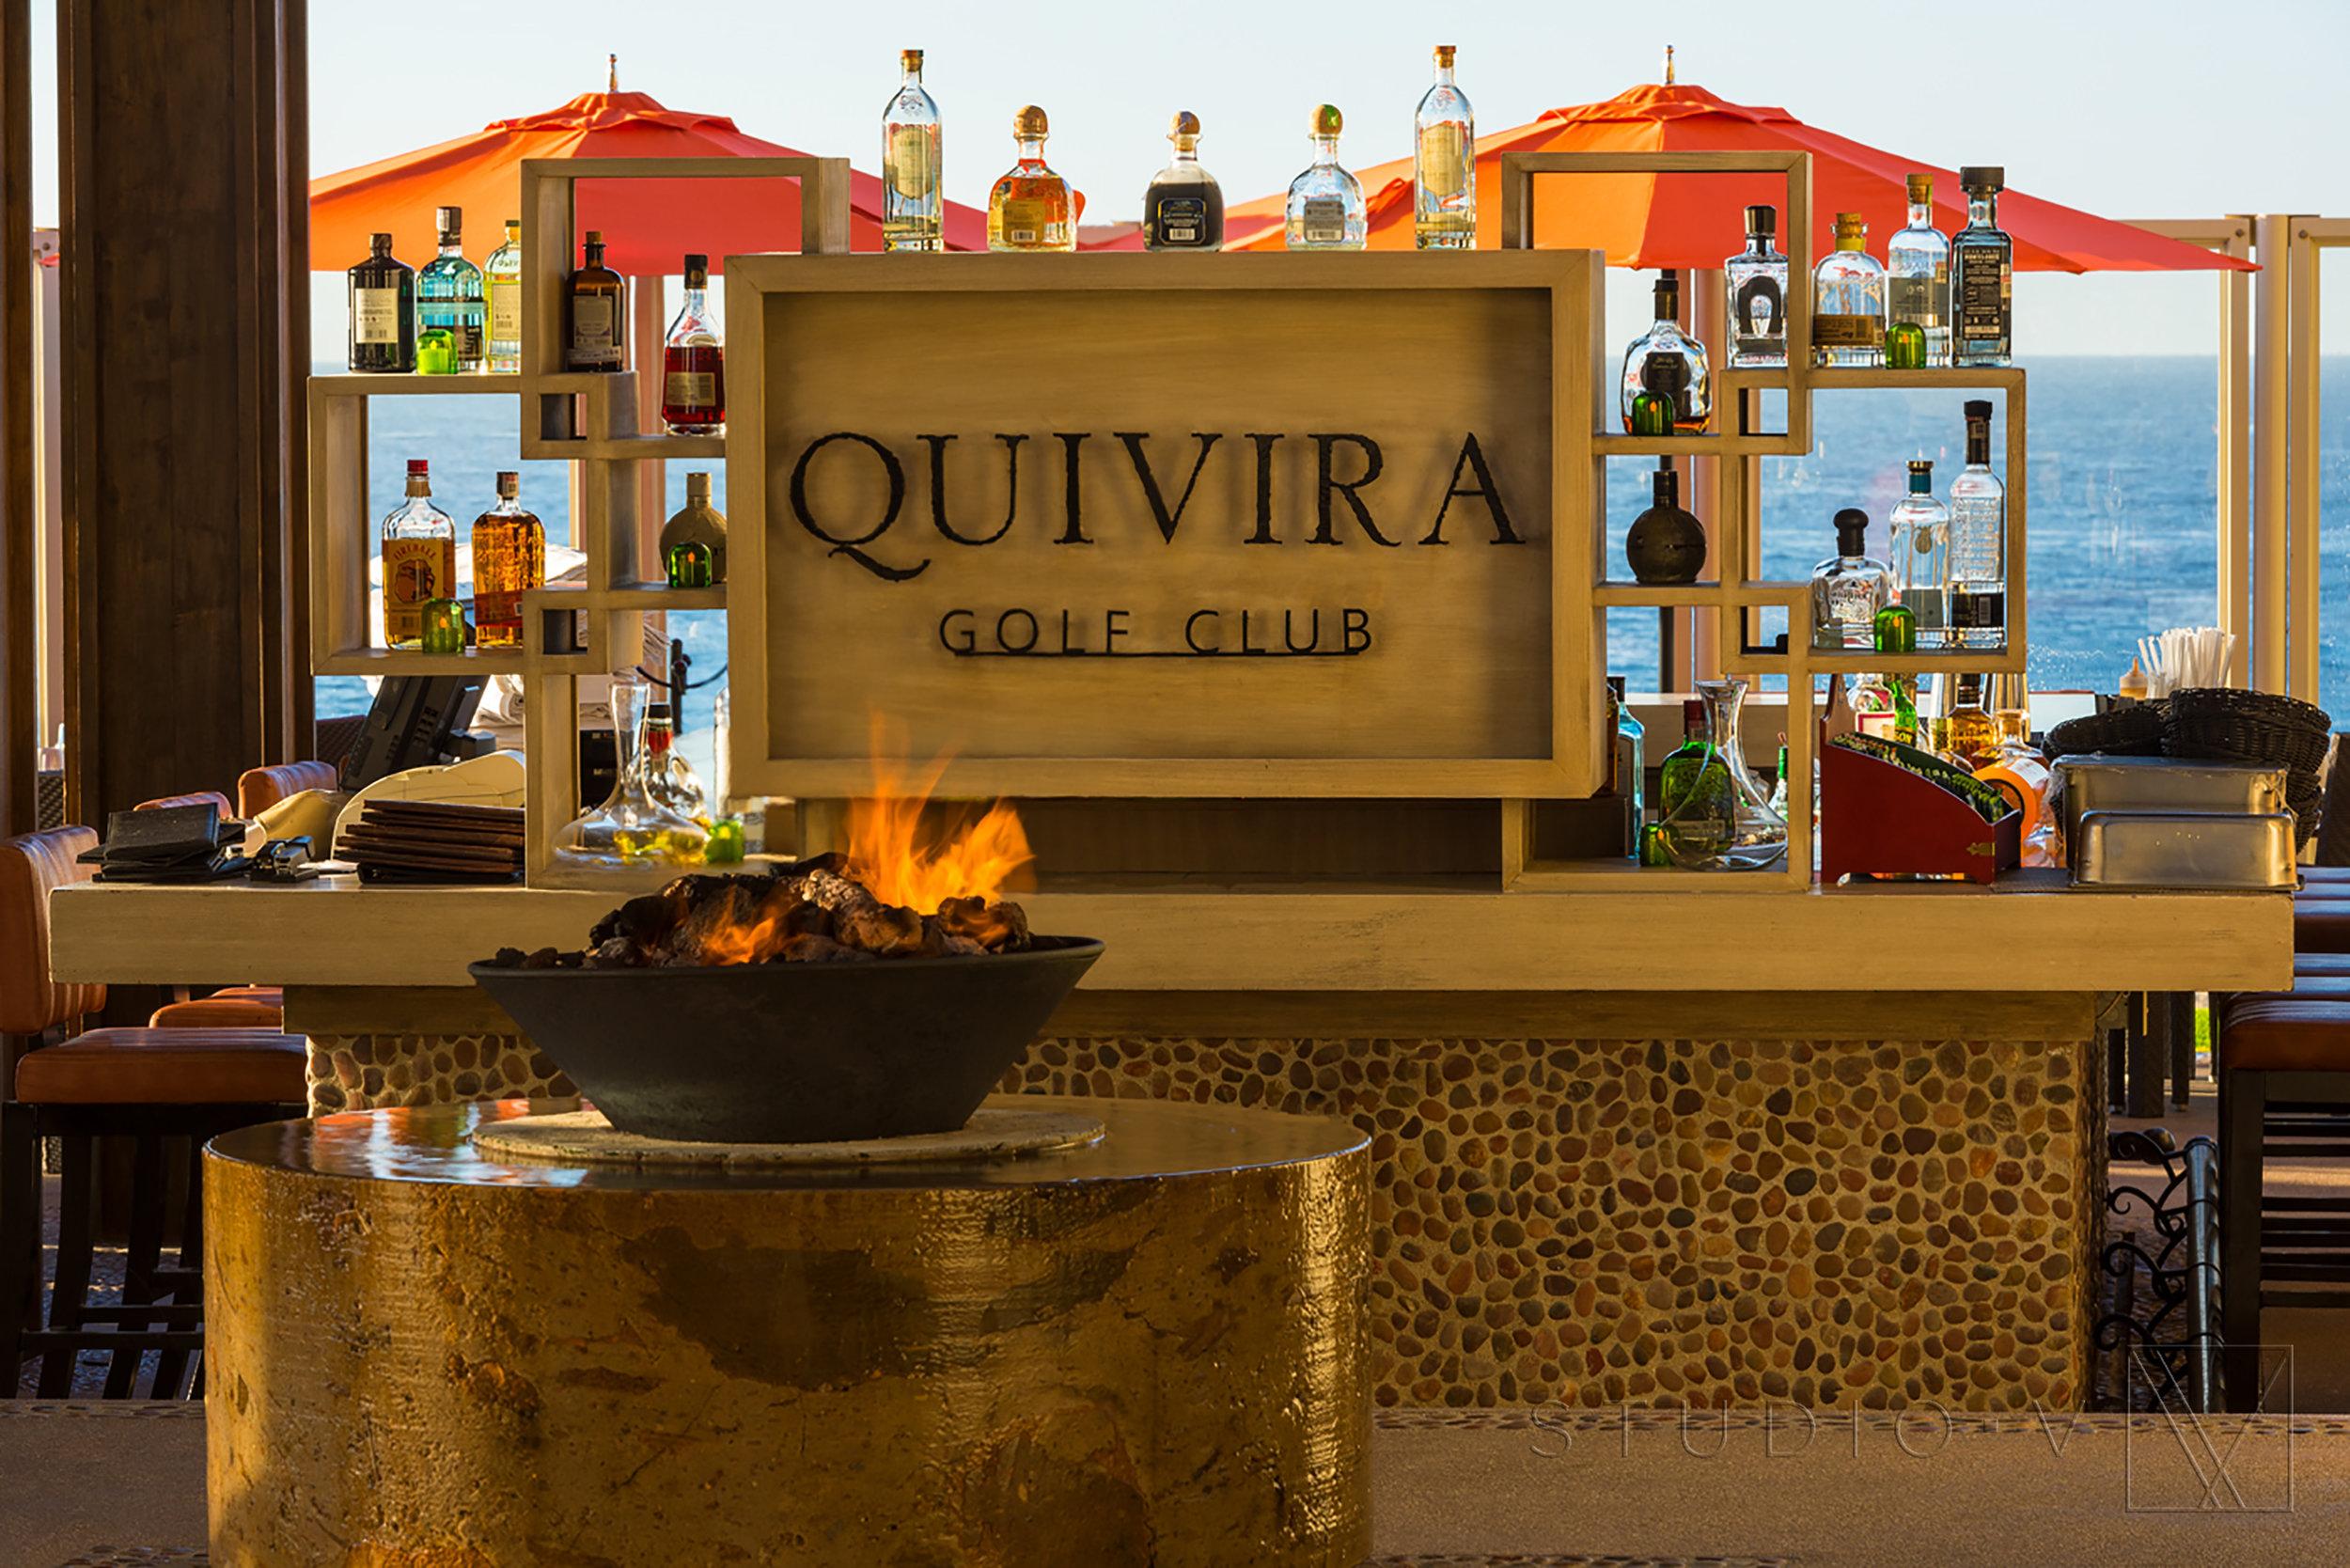 Quivira Clubhouse Sunset Beach Cabo San Lucas Studio V Interior Architecture and Design Scottsdale Arizona AZ (24).jpg